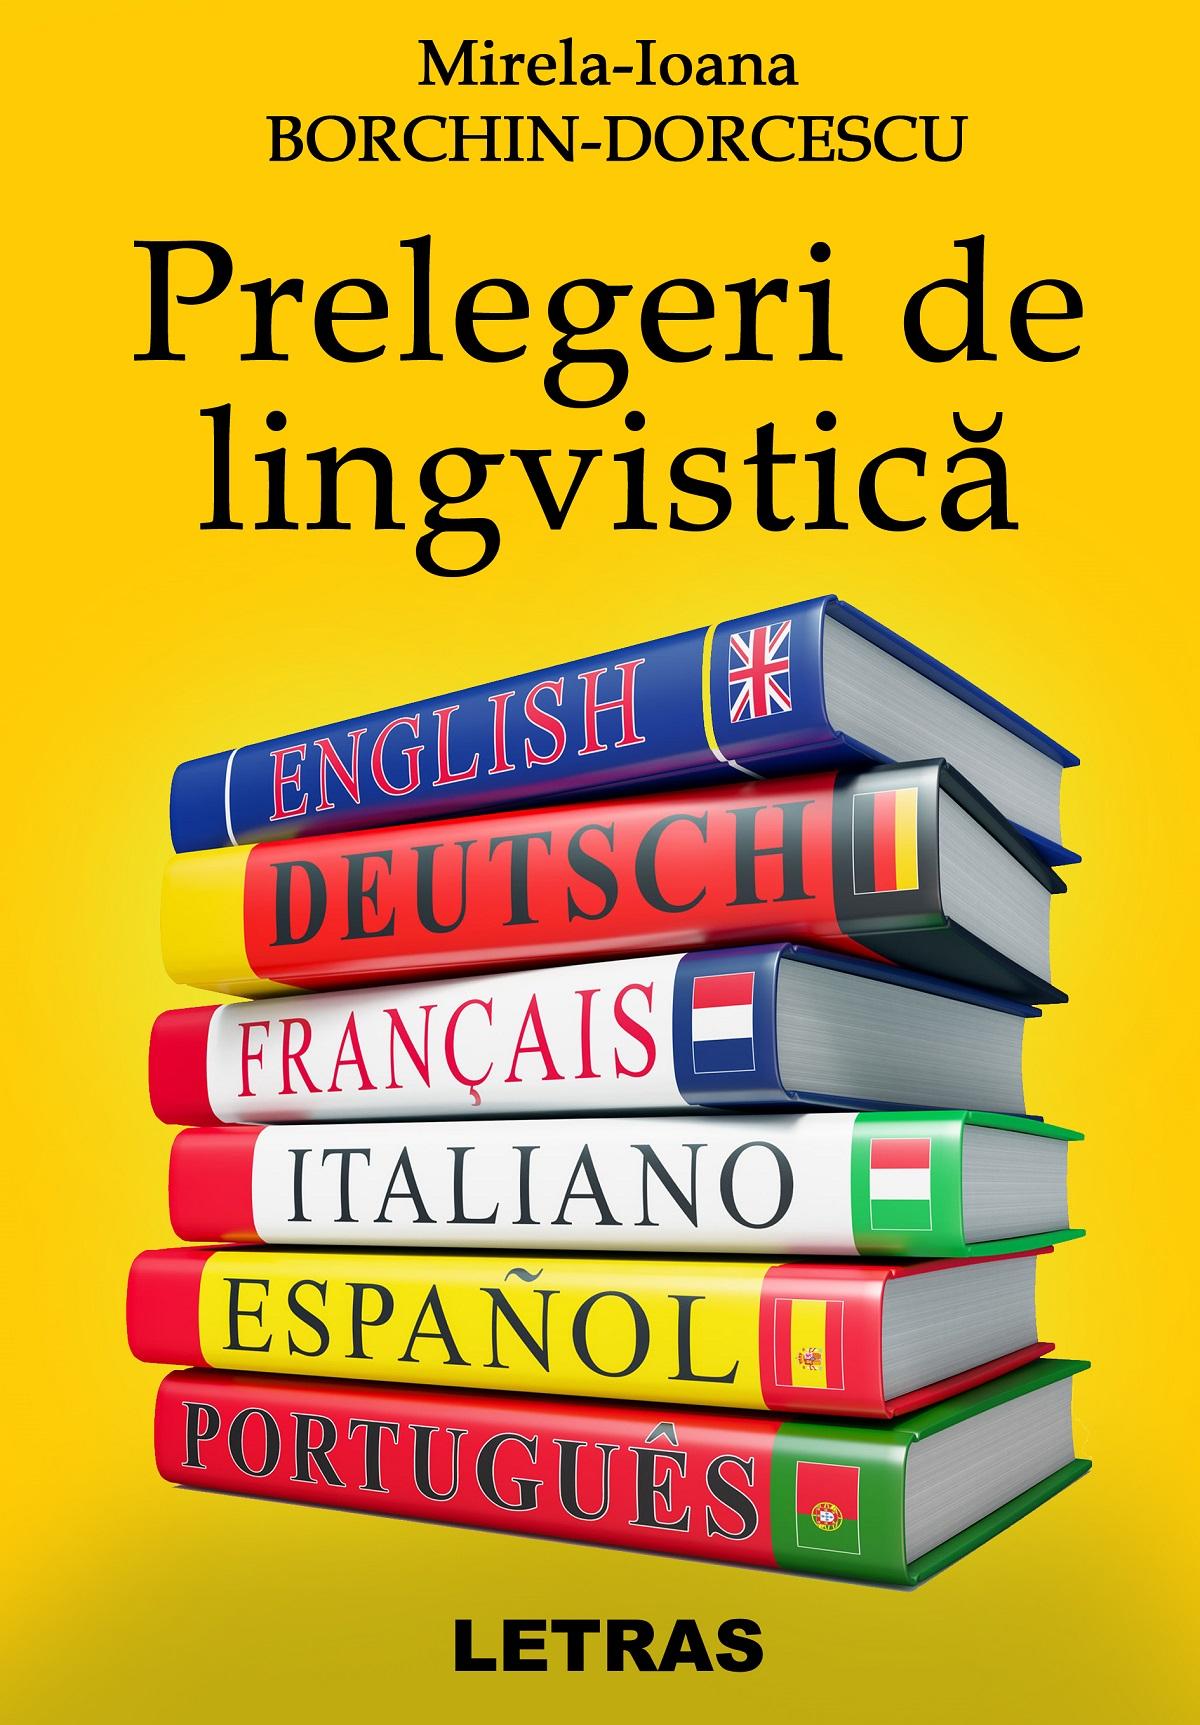 Prelegeri de lingvistica - Mirela Ioana Borchin Dorcescu - curs universitar _ Editura Letras 2020